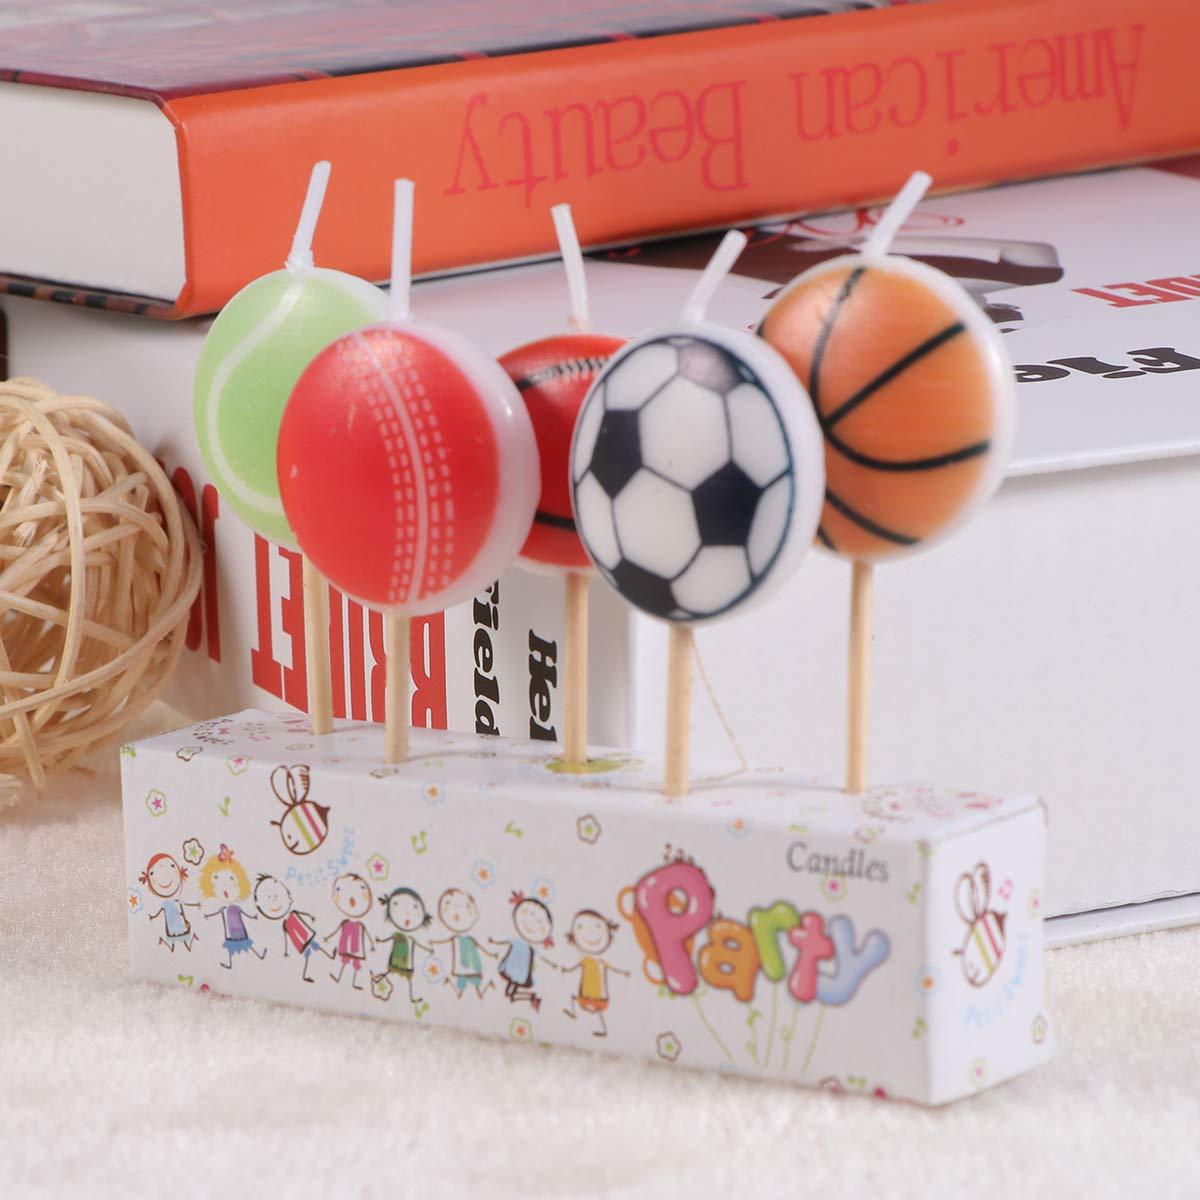 Amosfun - Juego de 5 Bolas de cumpleaños, balón de fútbol, Velas ...